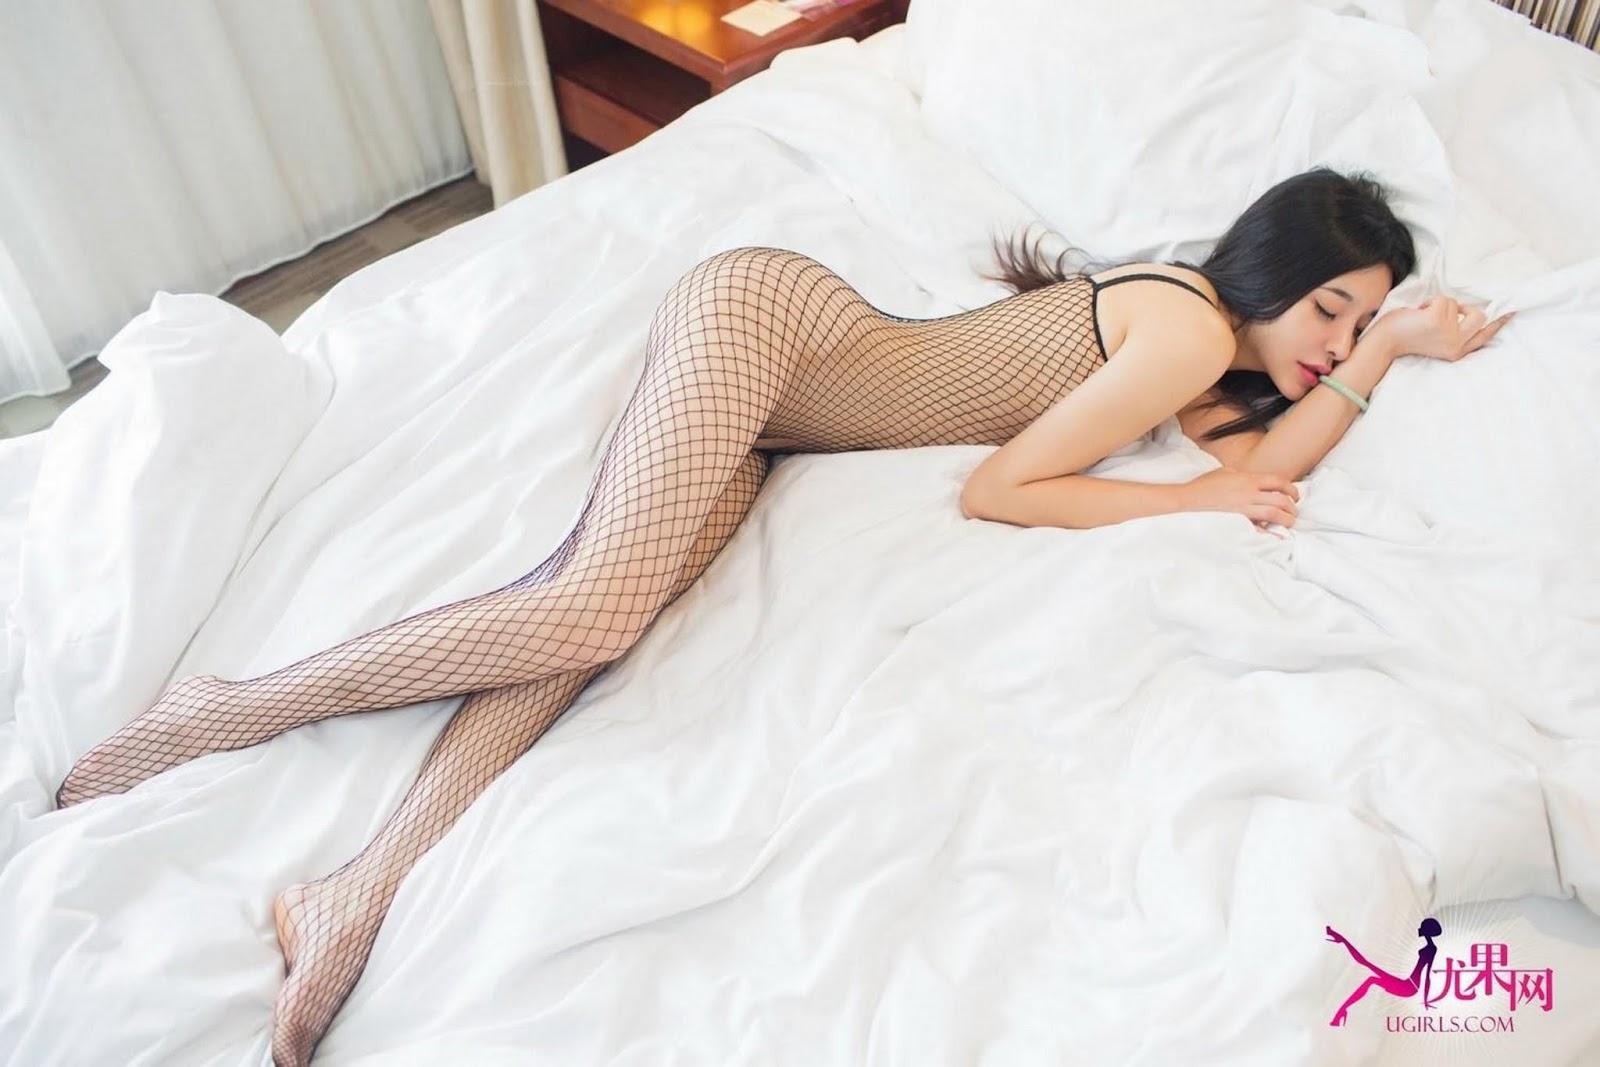 20 - Sexy Photo UGIRLS NO.103 Nude Girl